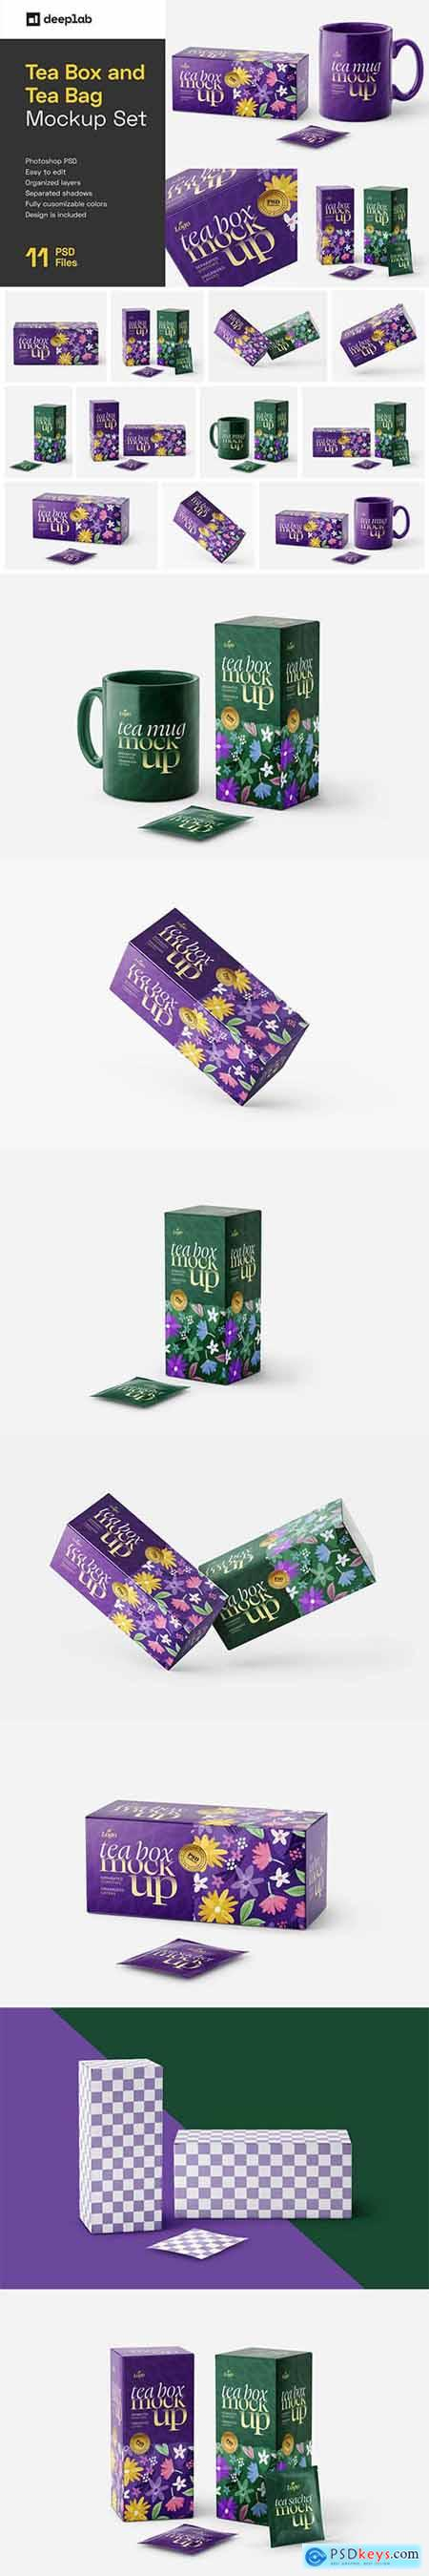 Creativemarket Tea Box and Tea Bag Mockup Set 6037096